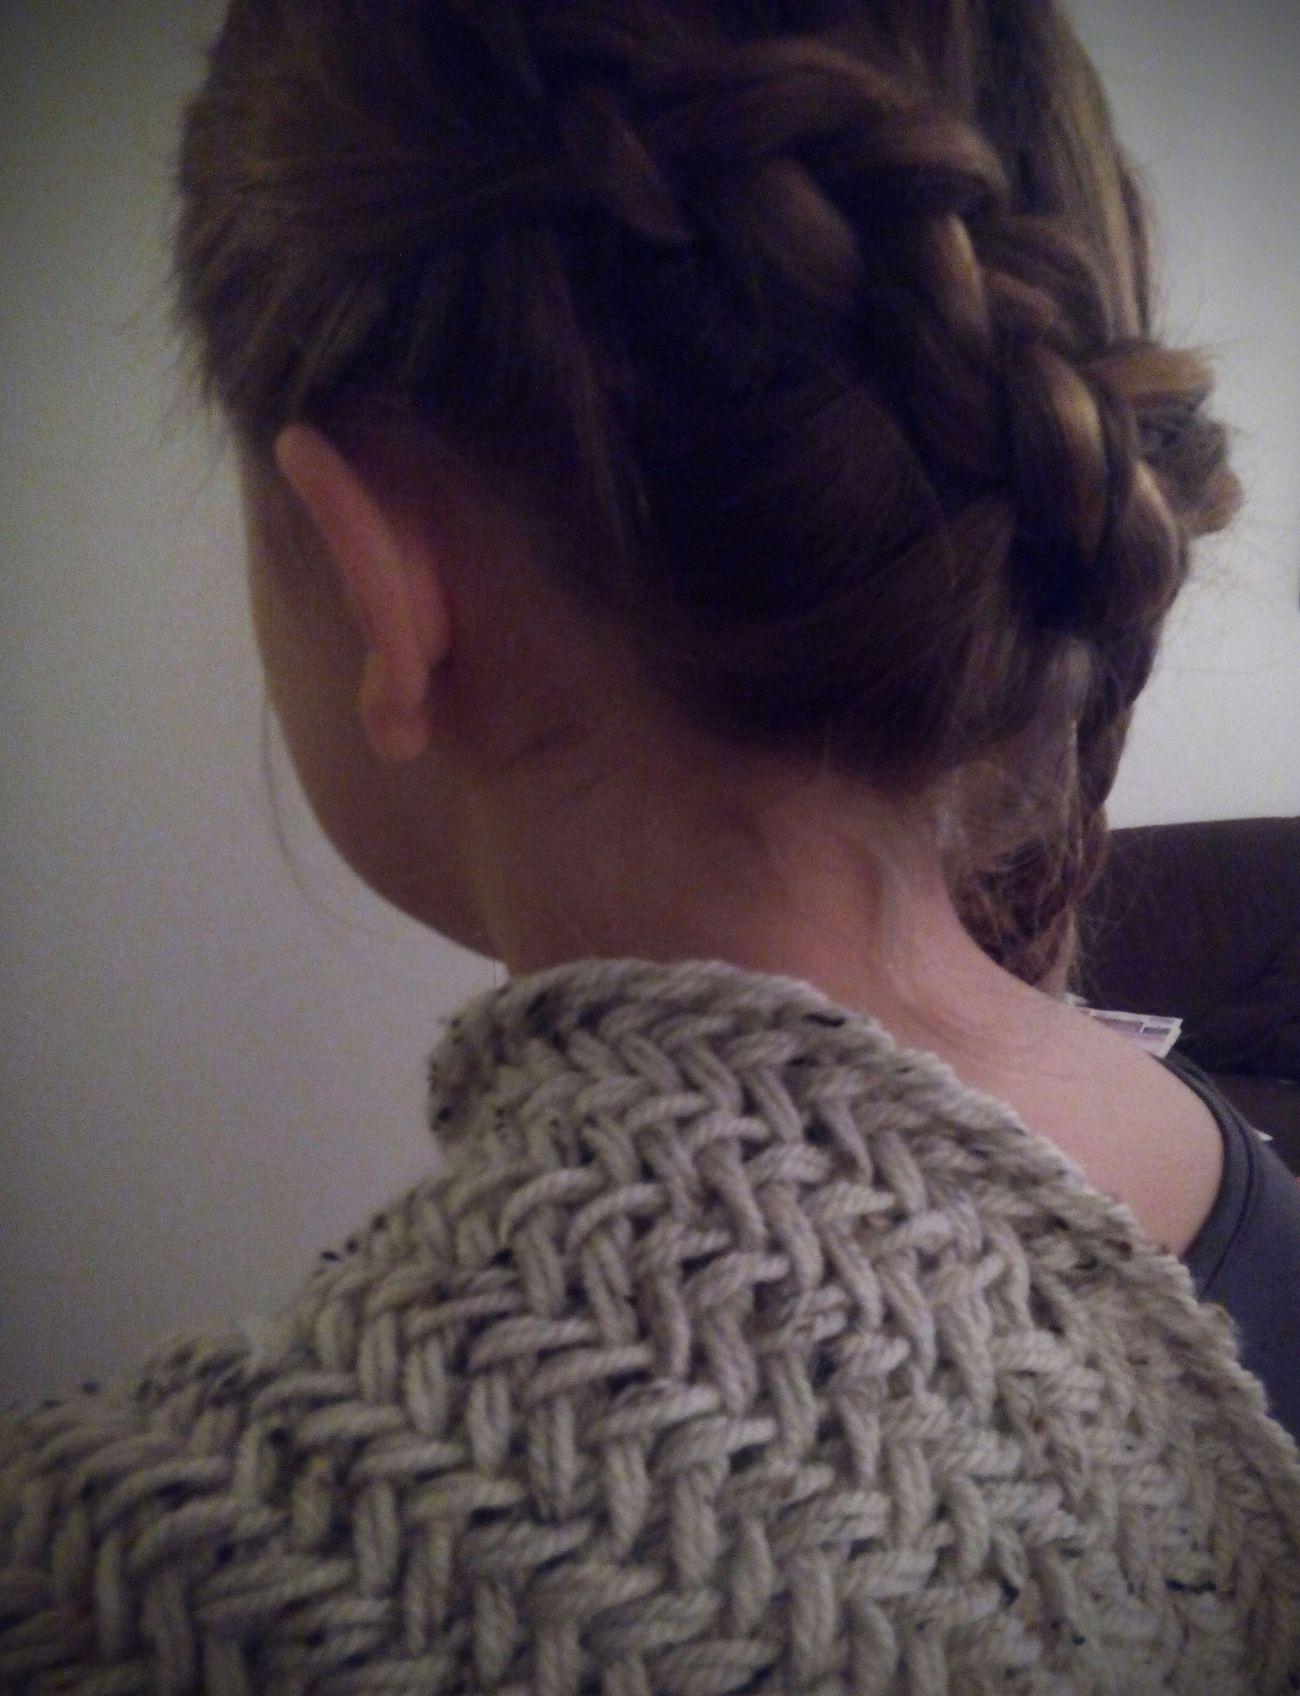 Braid Braided Braided Hair Close-up Herringbone Stitch Knitted  Knitting One Person Wool